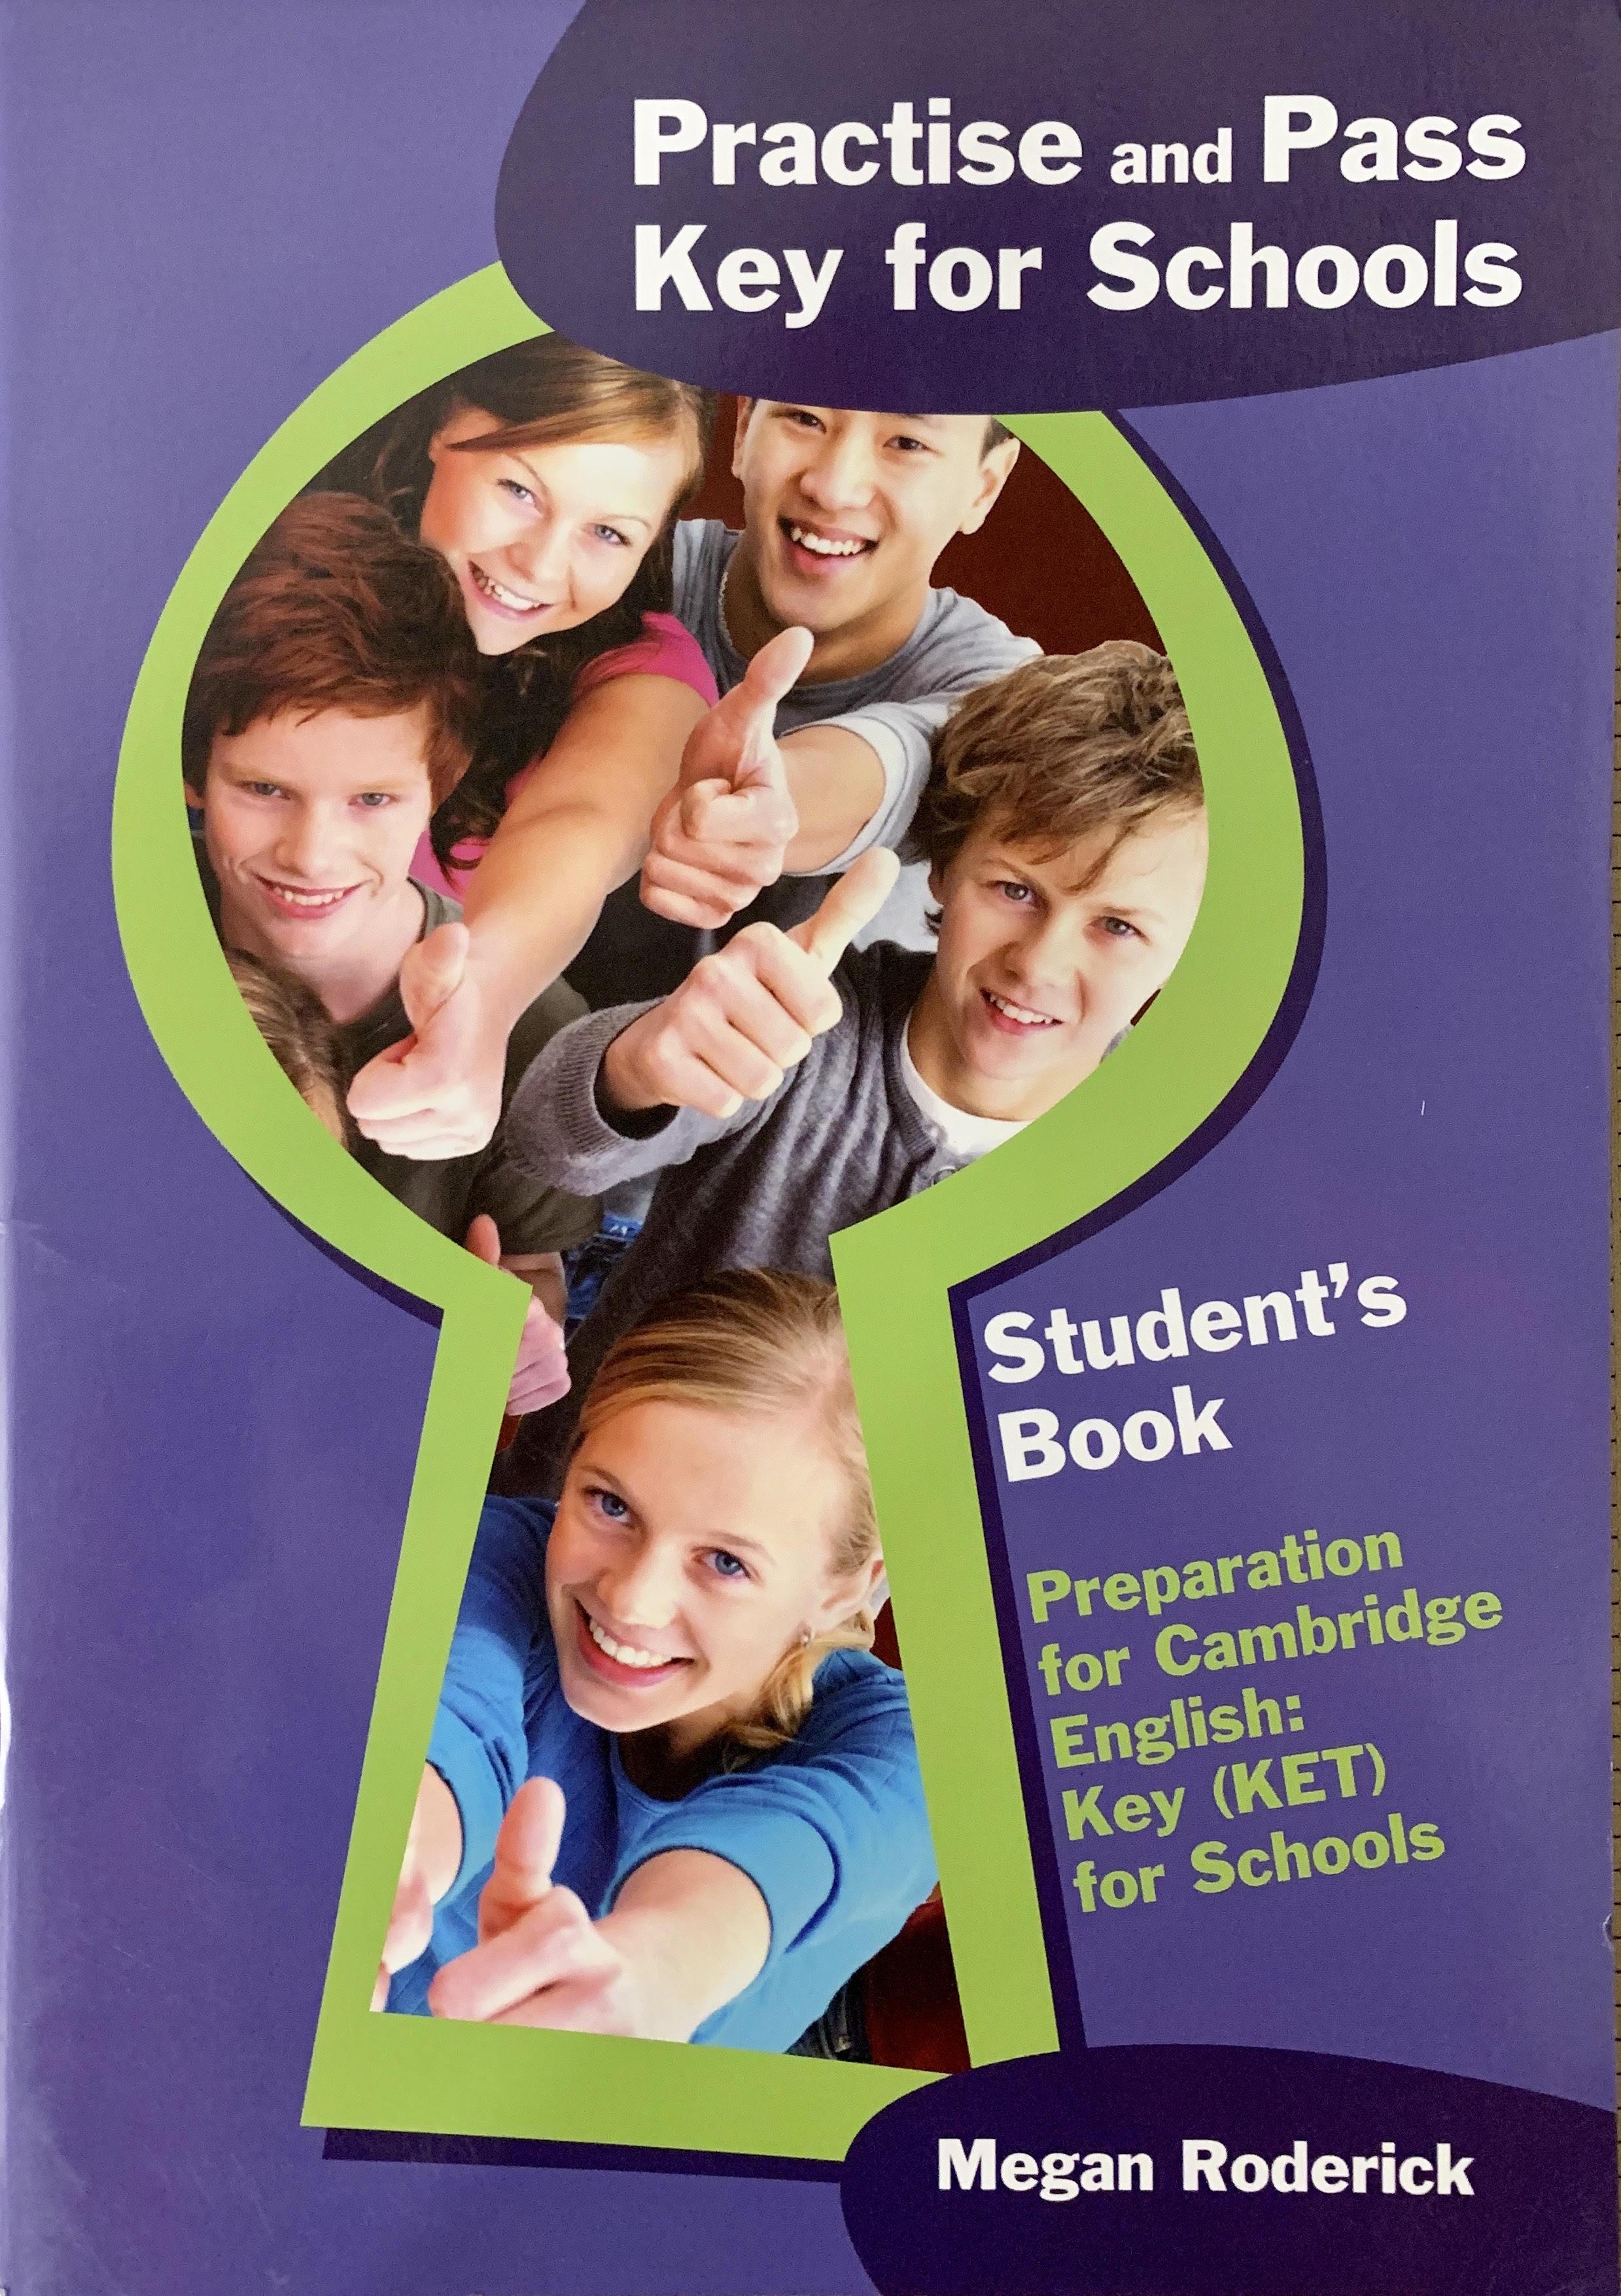 Preparation for Cambridge English Key ( KET ) for Schools